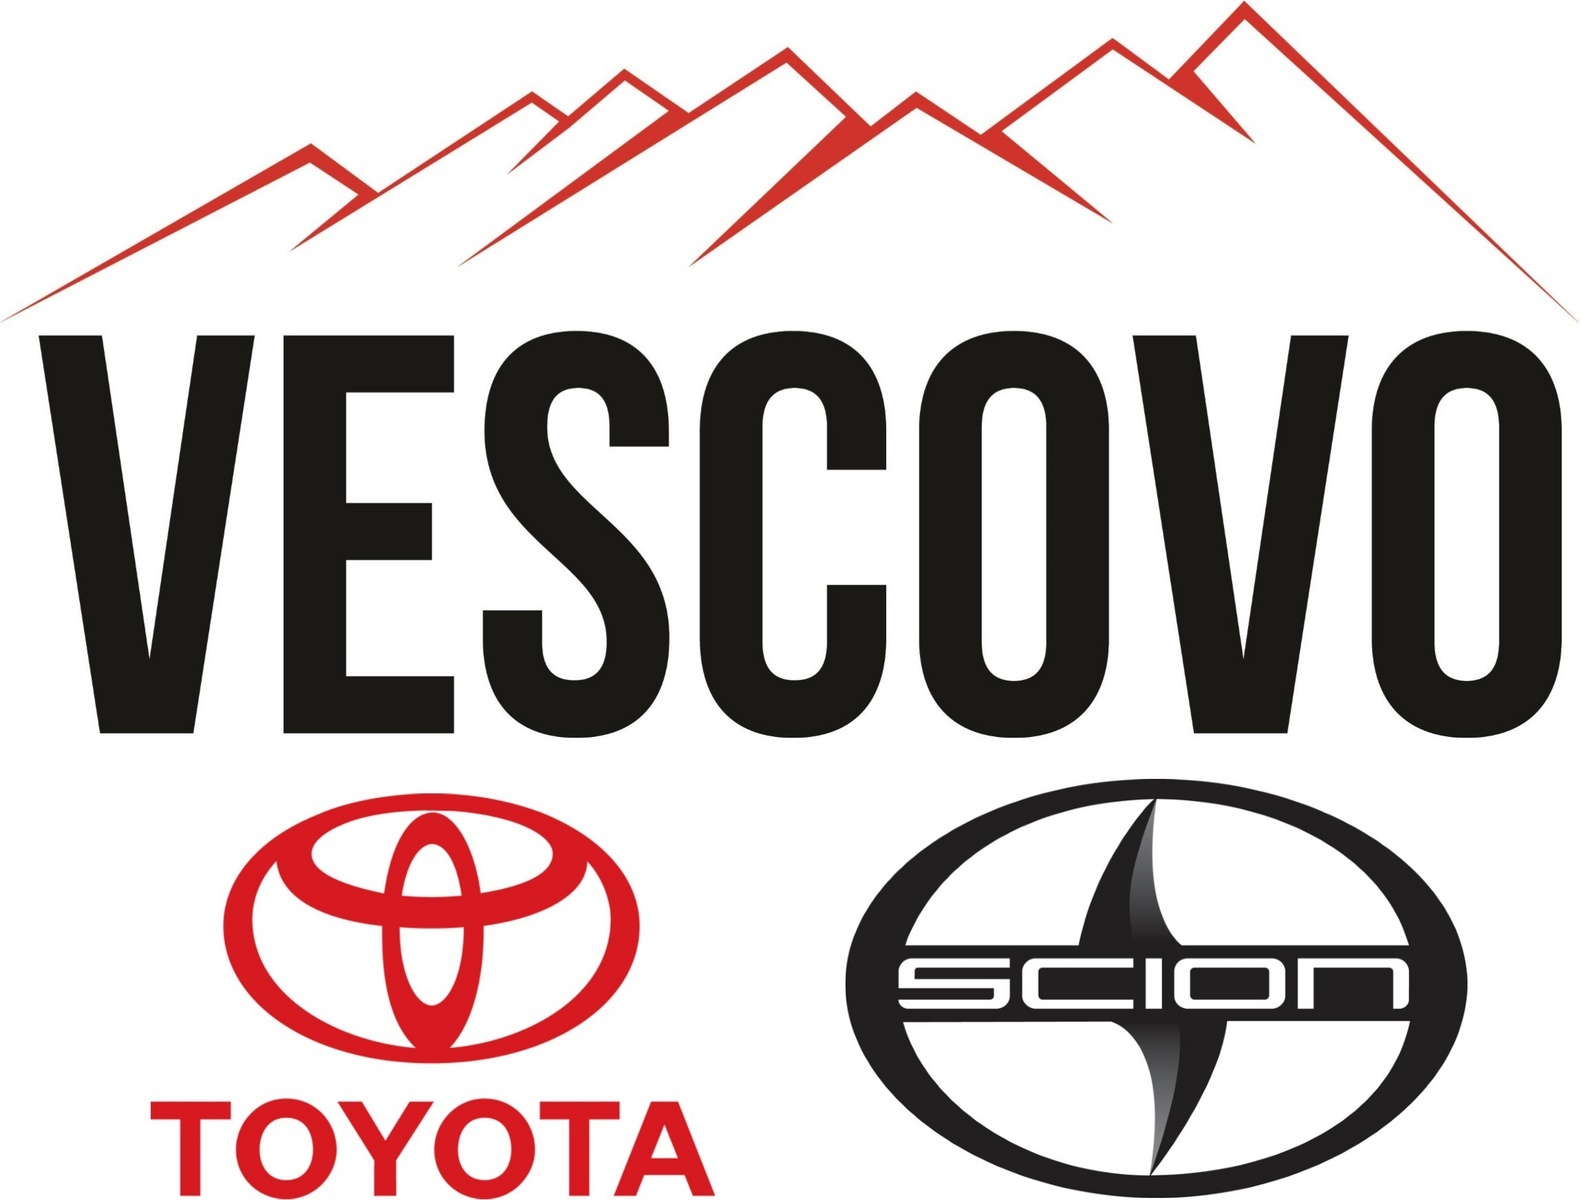 Hyundai Las Cruces >> Vescovo Toyota - Las Cruces, NM - Reviews & Deals - CarGurus